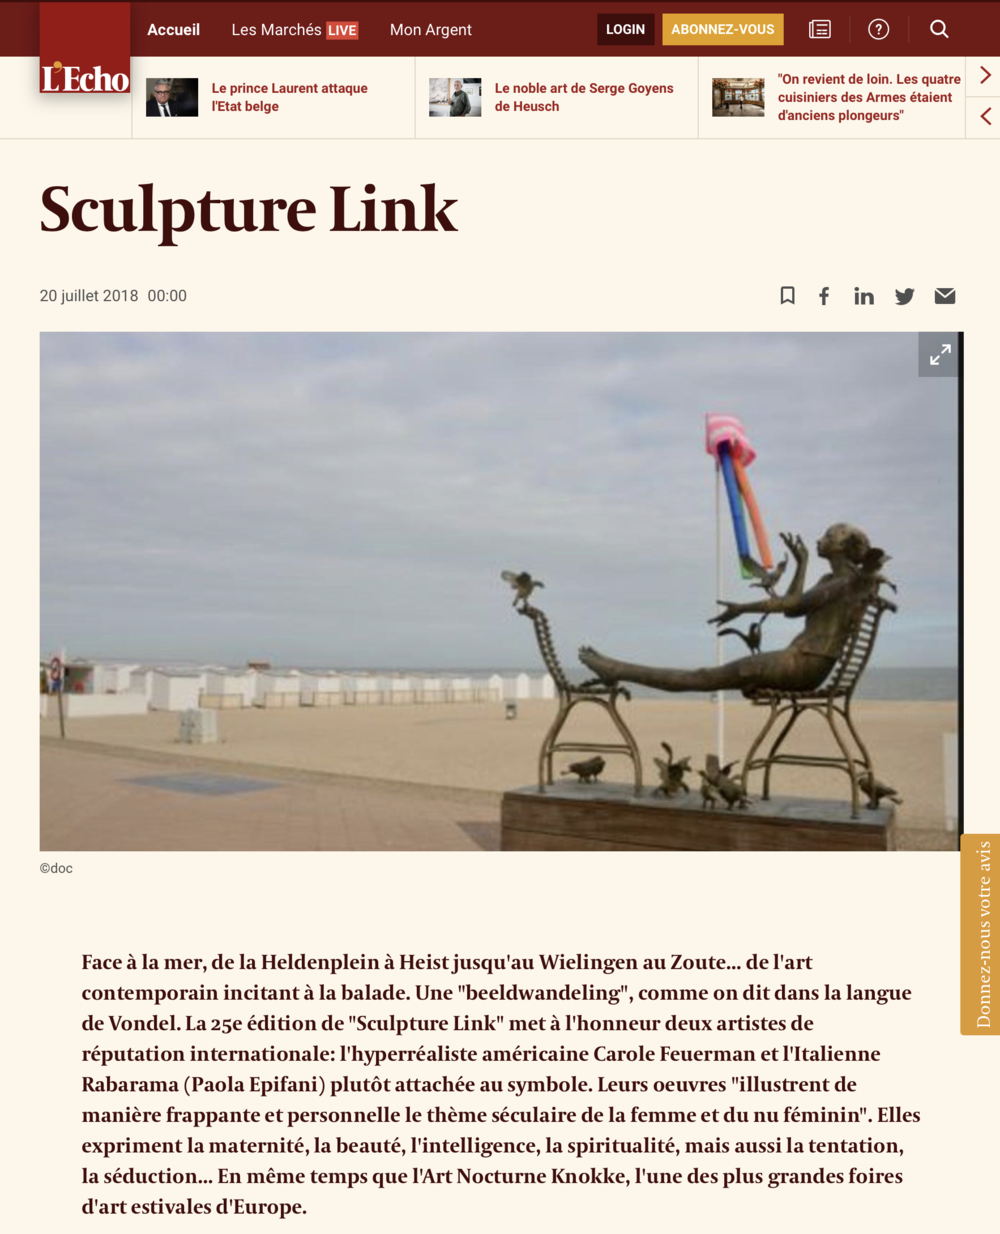 Sculpture Link